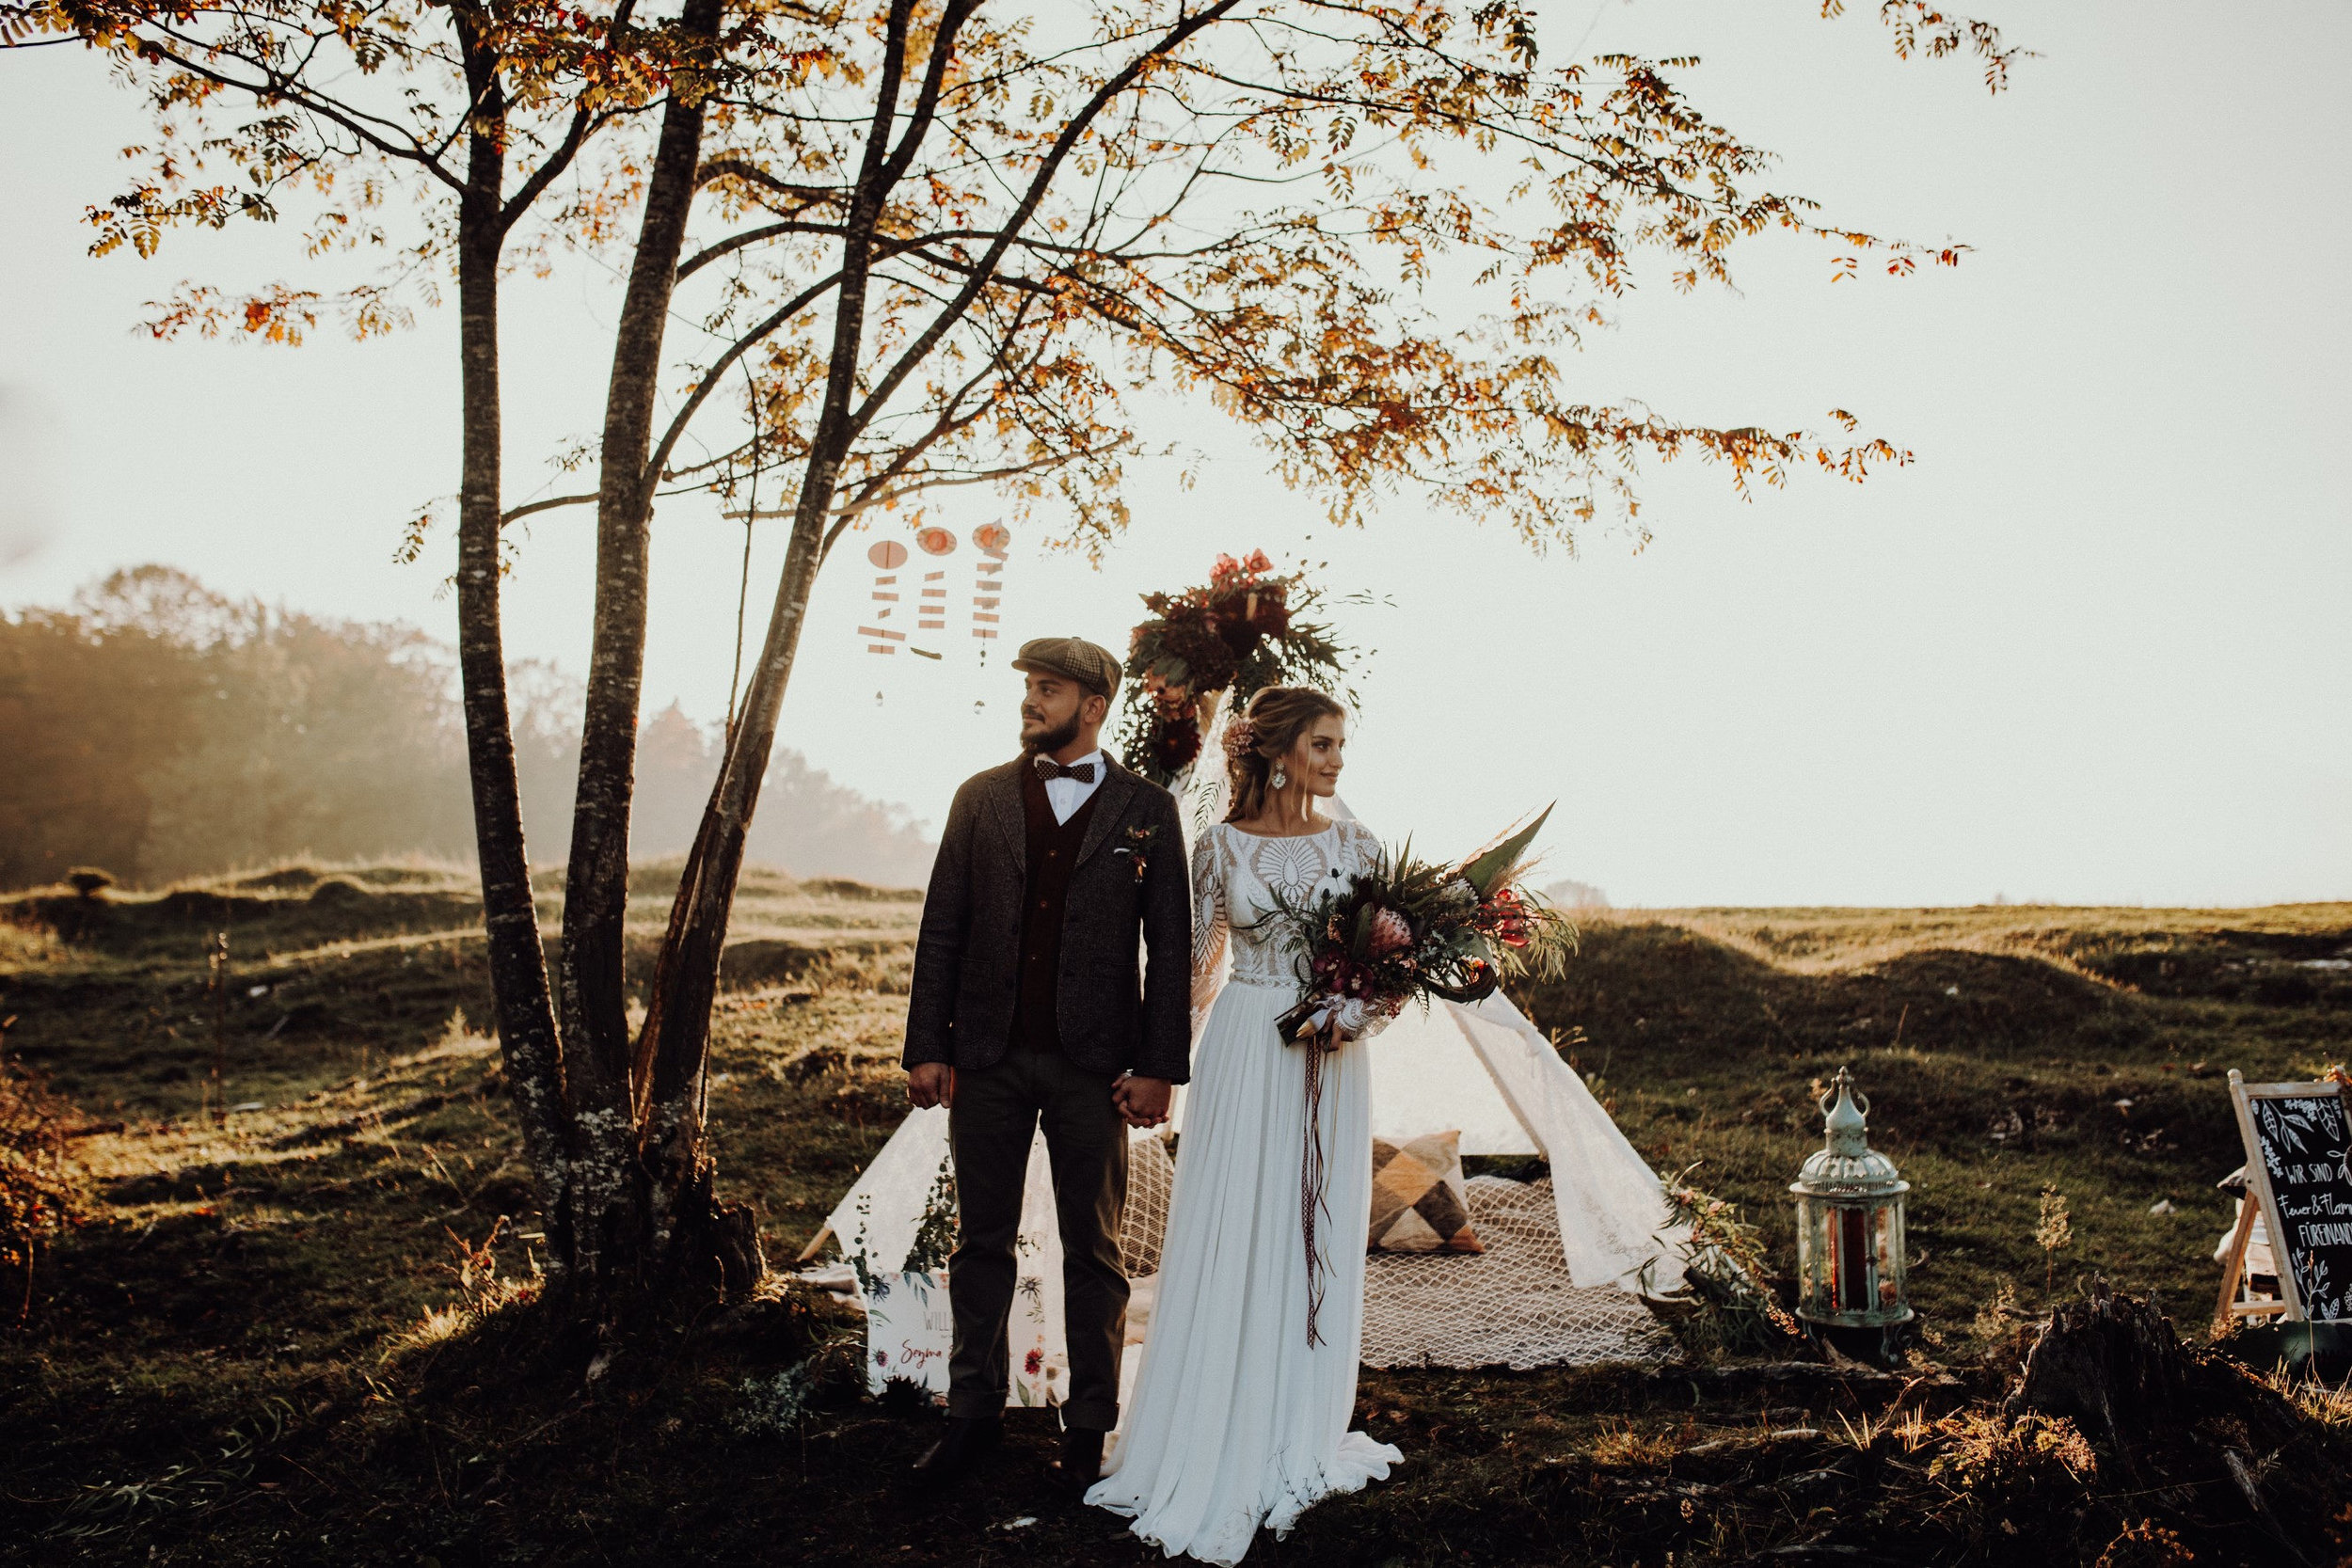 theclickwedding-weddingdreams-bohemianromance-1-20.jpg